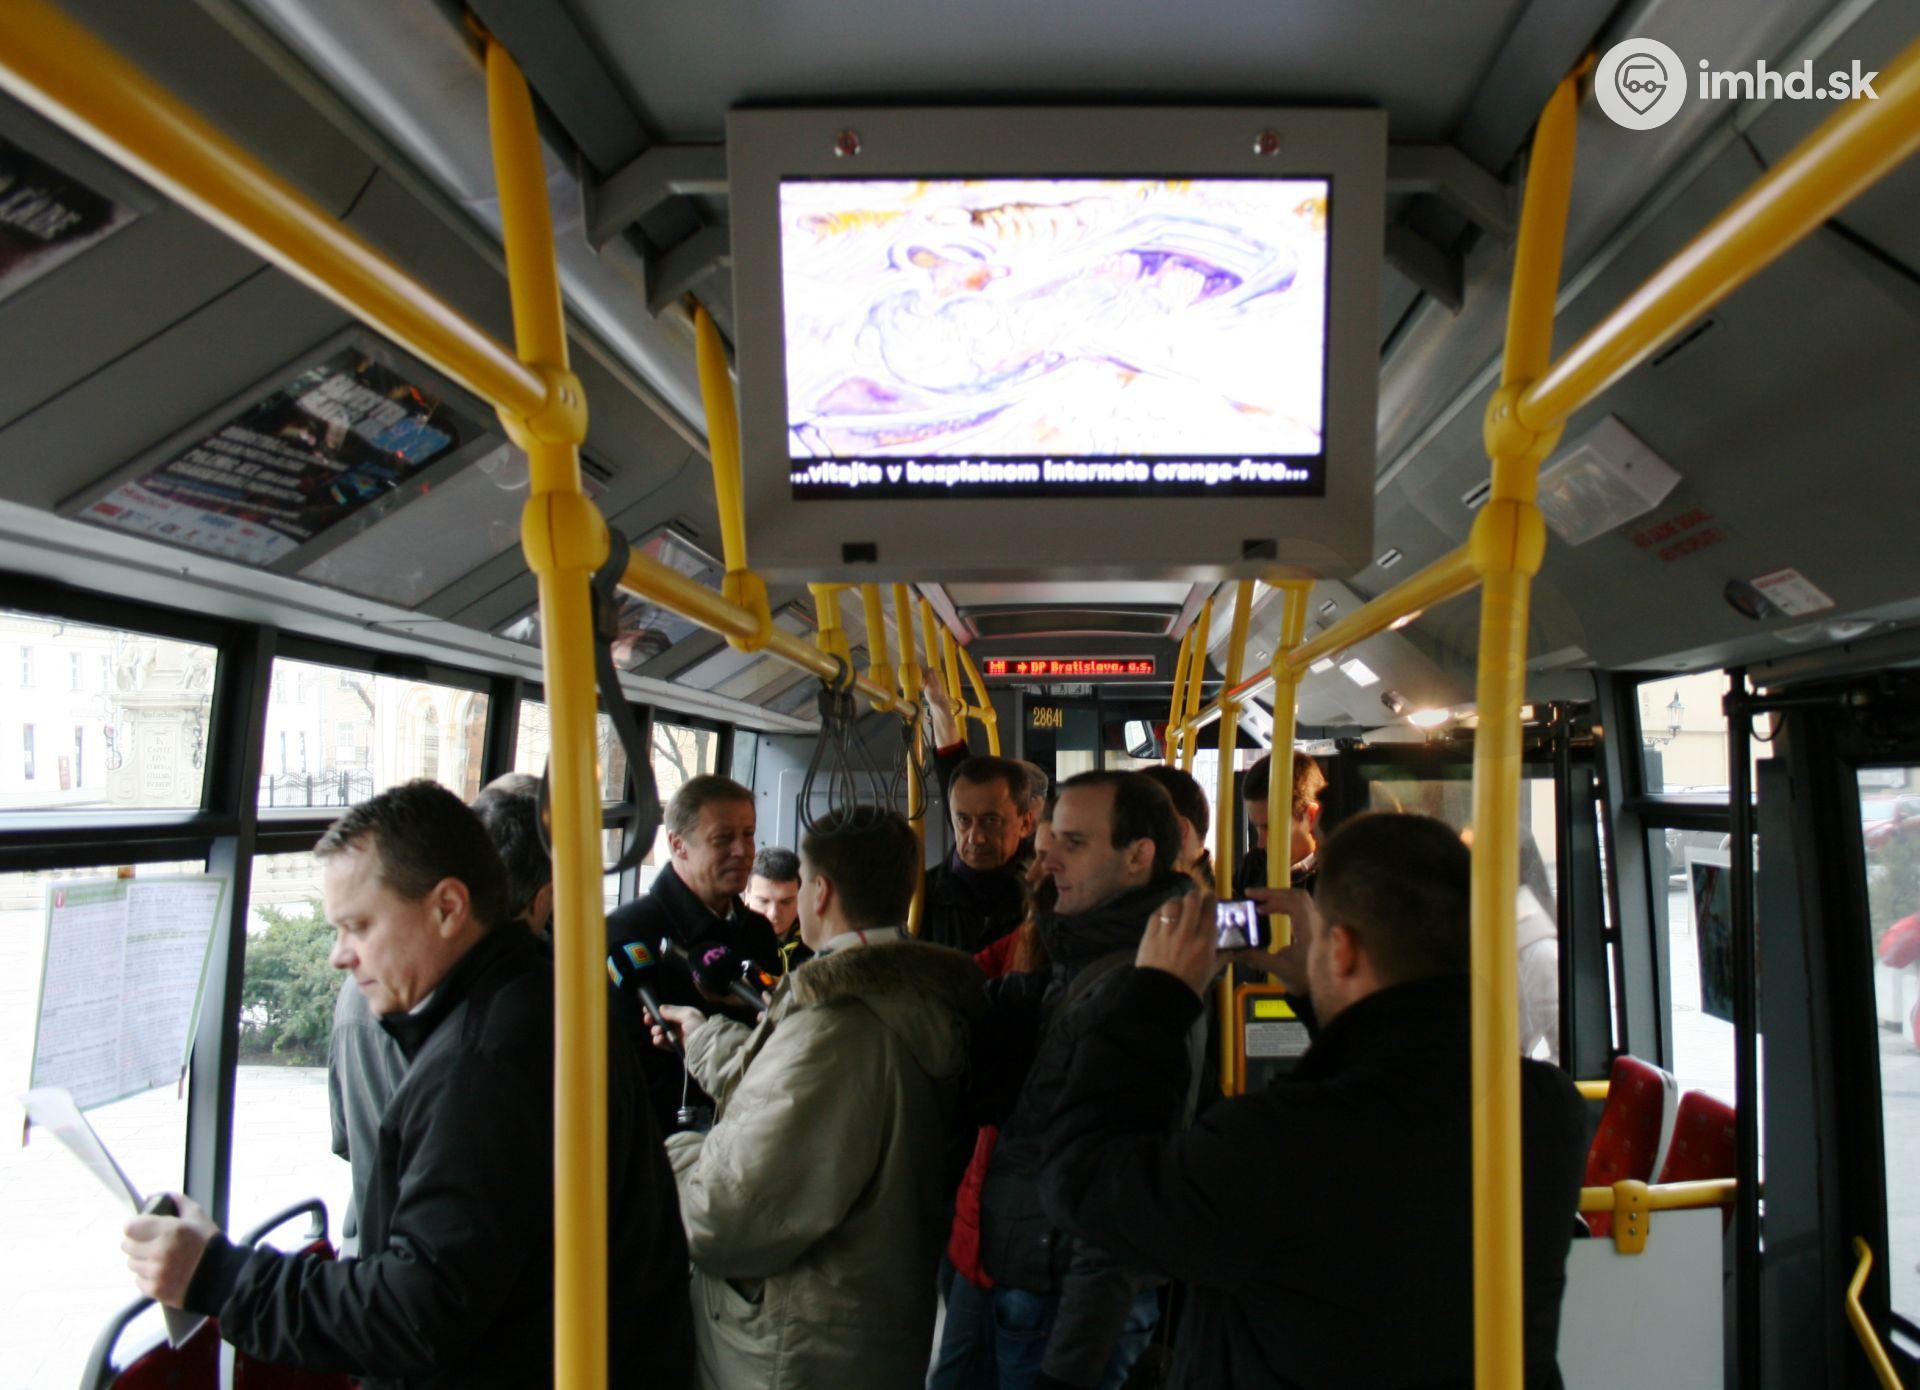 Wi-fi internet sa vracia do autobusov MHD • imhd.sk Bratislava